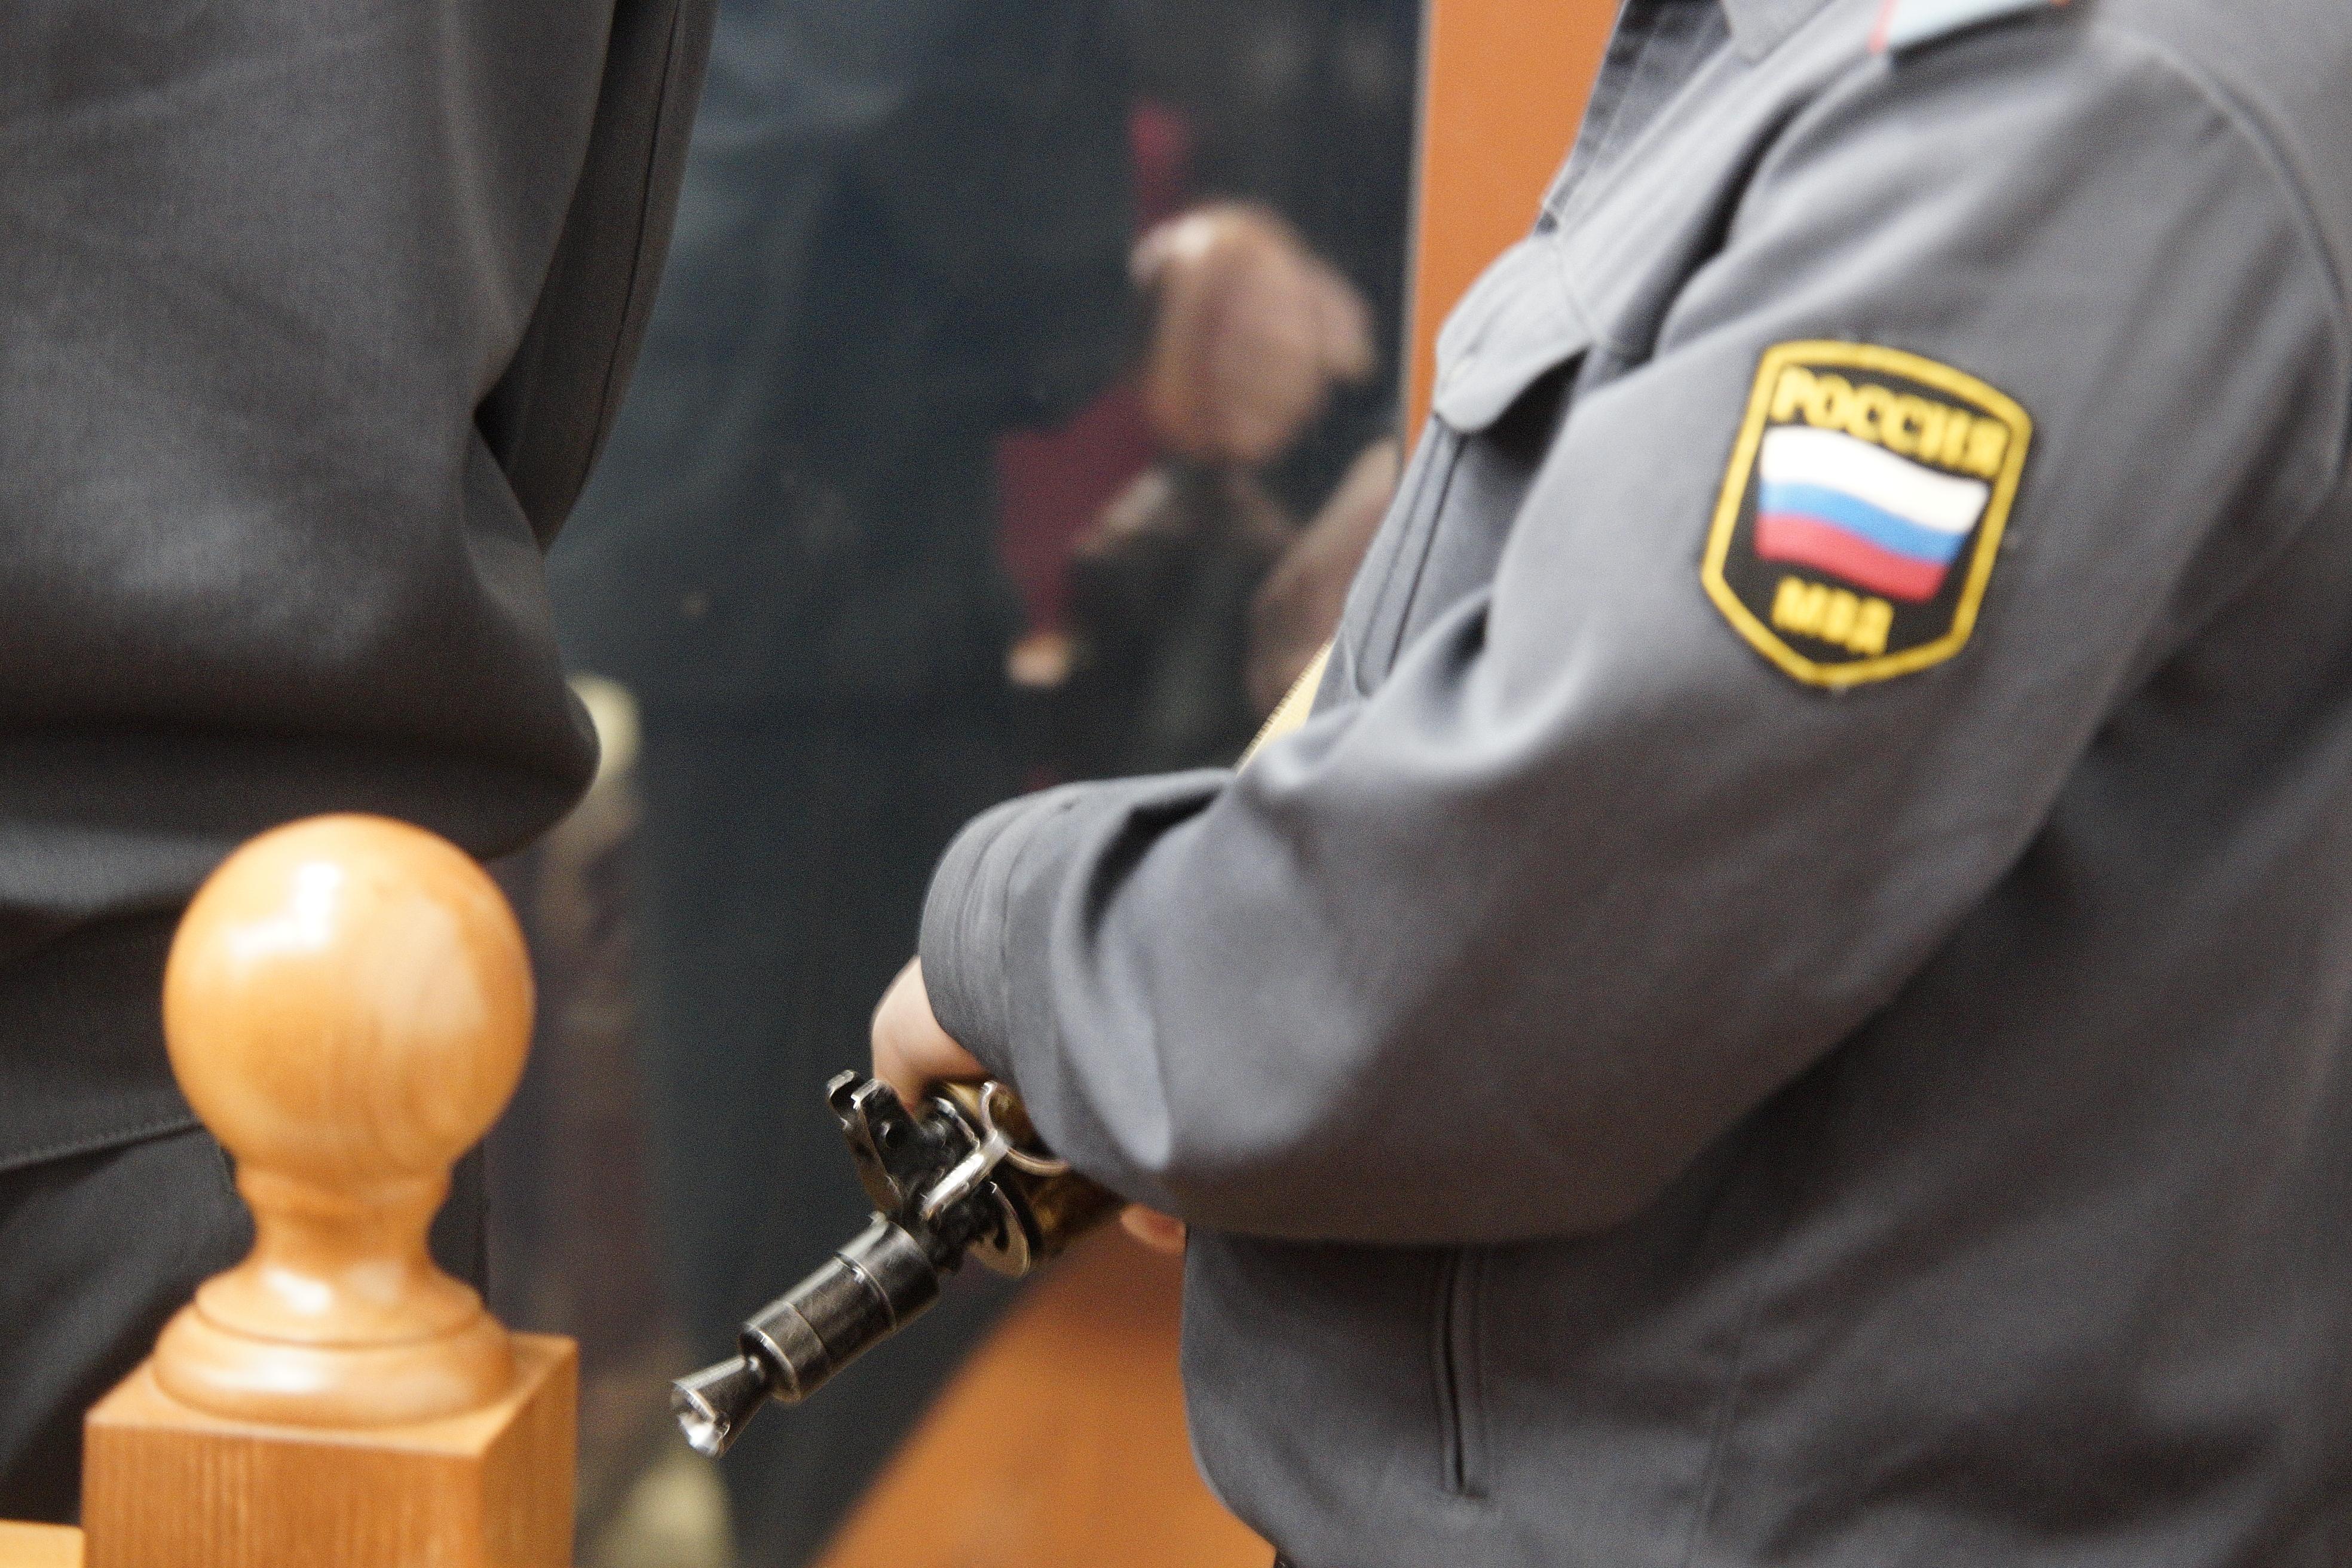 Вгостинице Екатеринбурга отыскали труп девушки